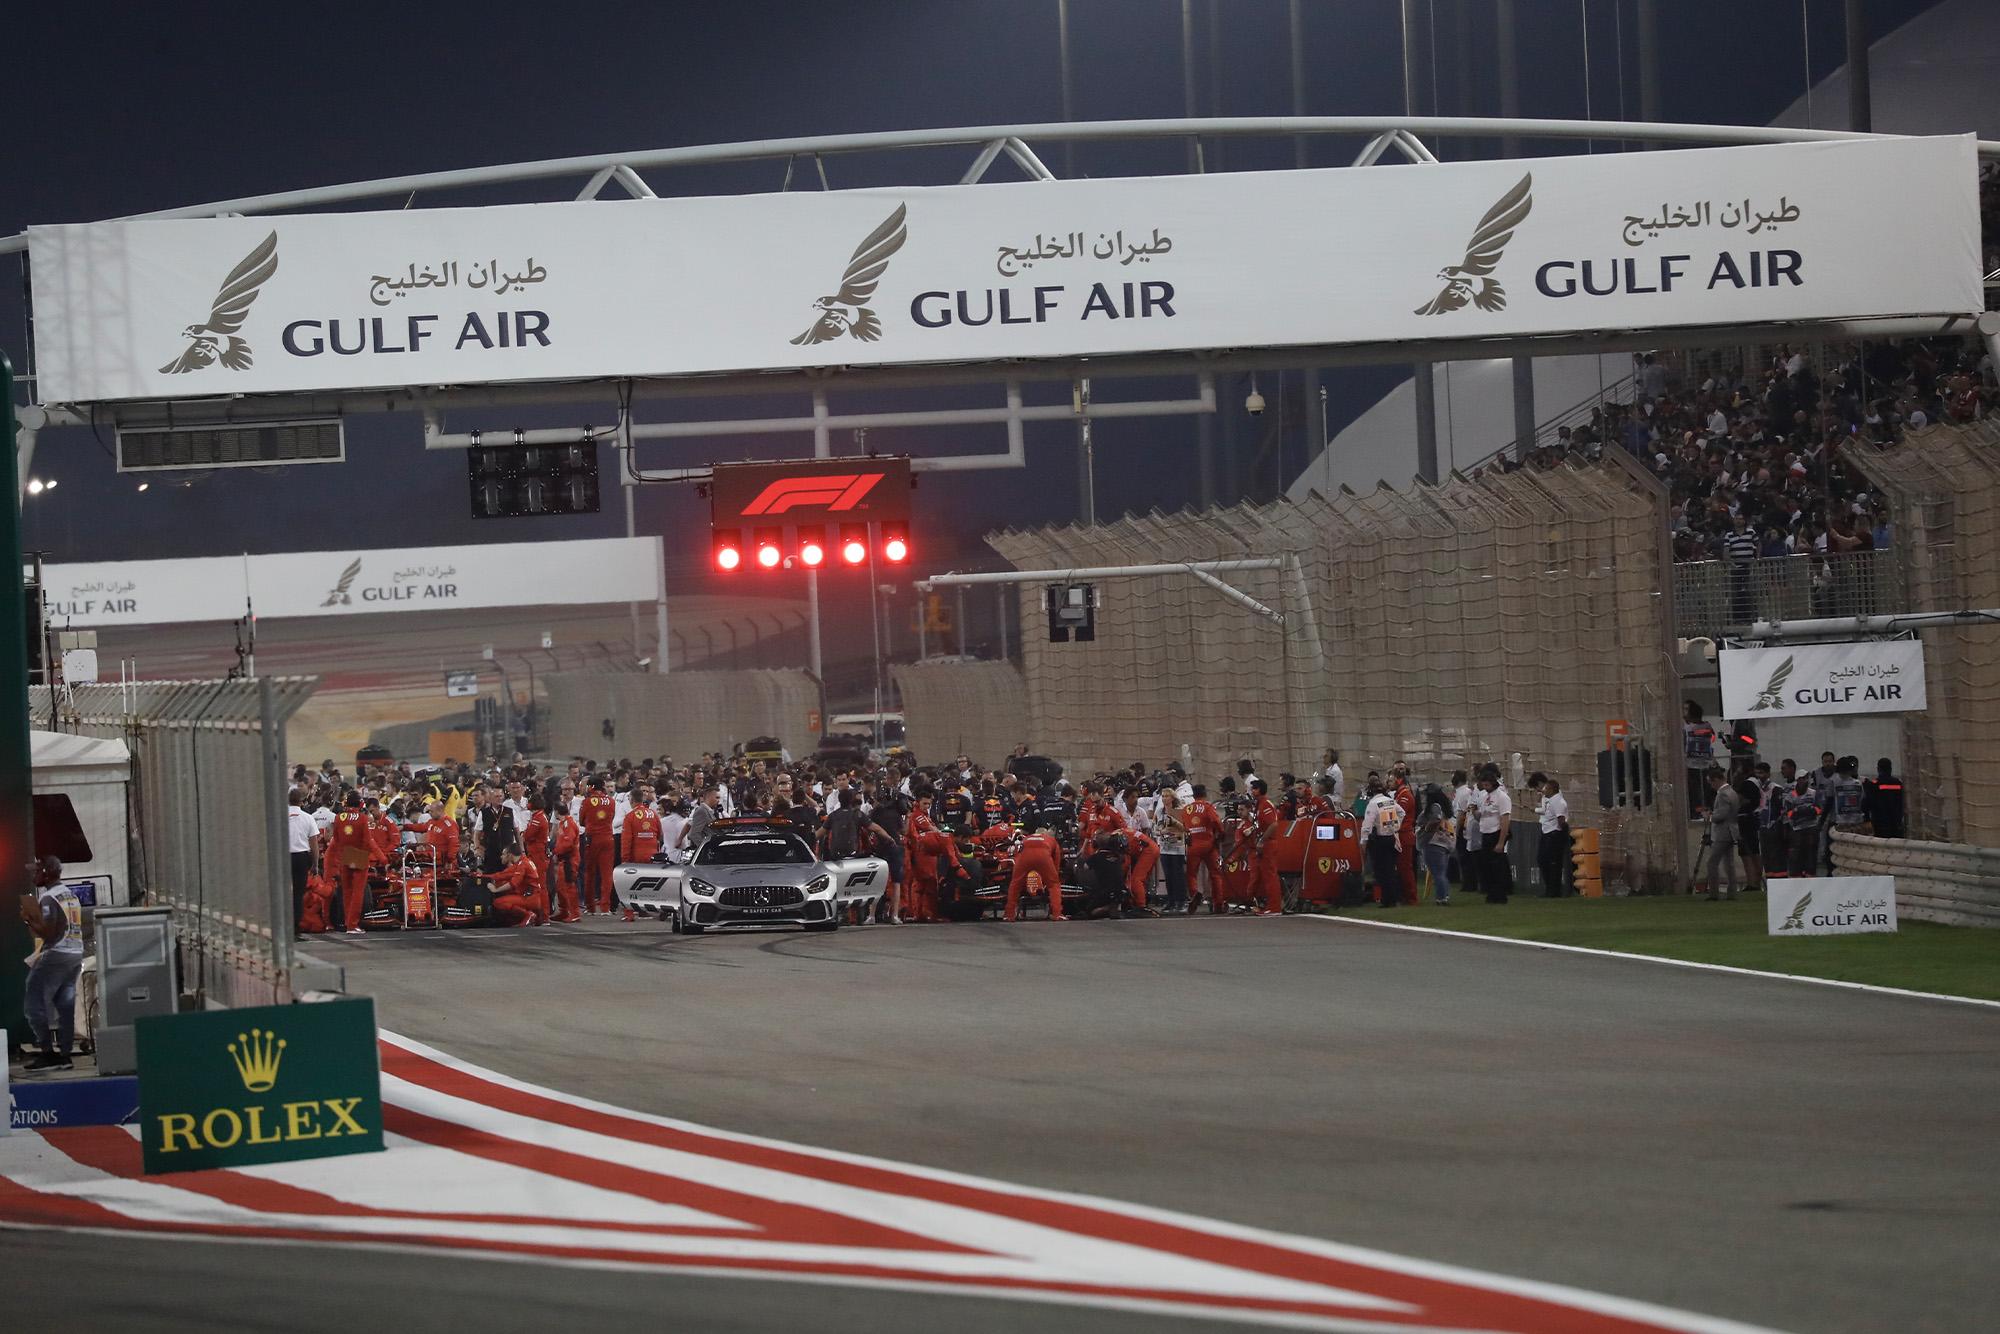 F1 suspended until end of May; Bahrain & Vietnam GPs postponed